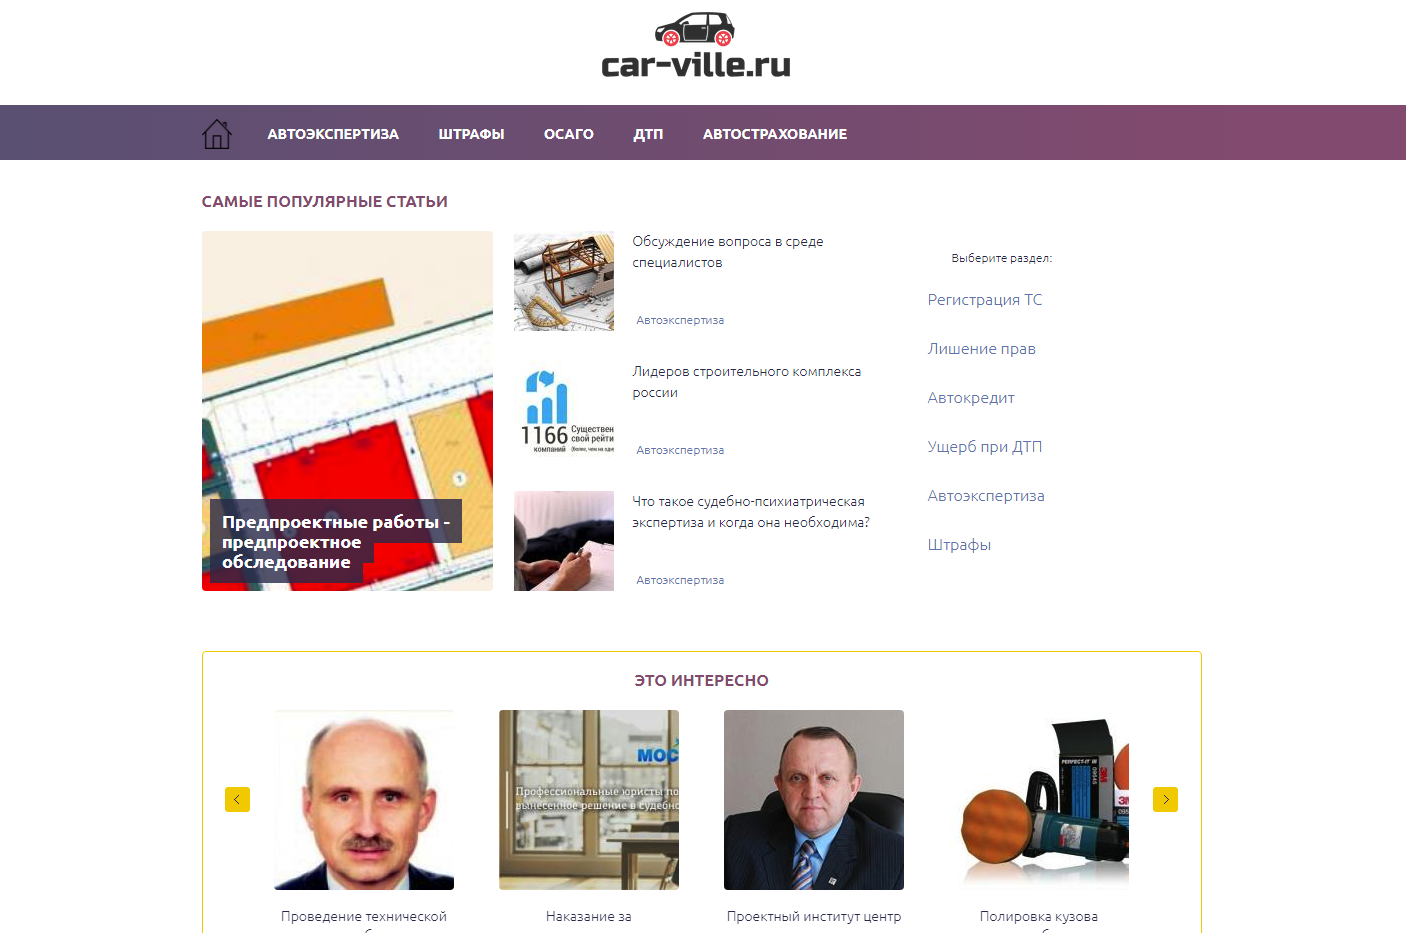 Официальный сайт Car-Ville www.car-ville.ru